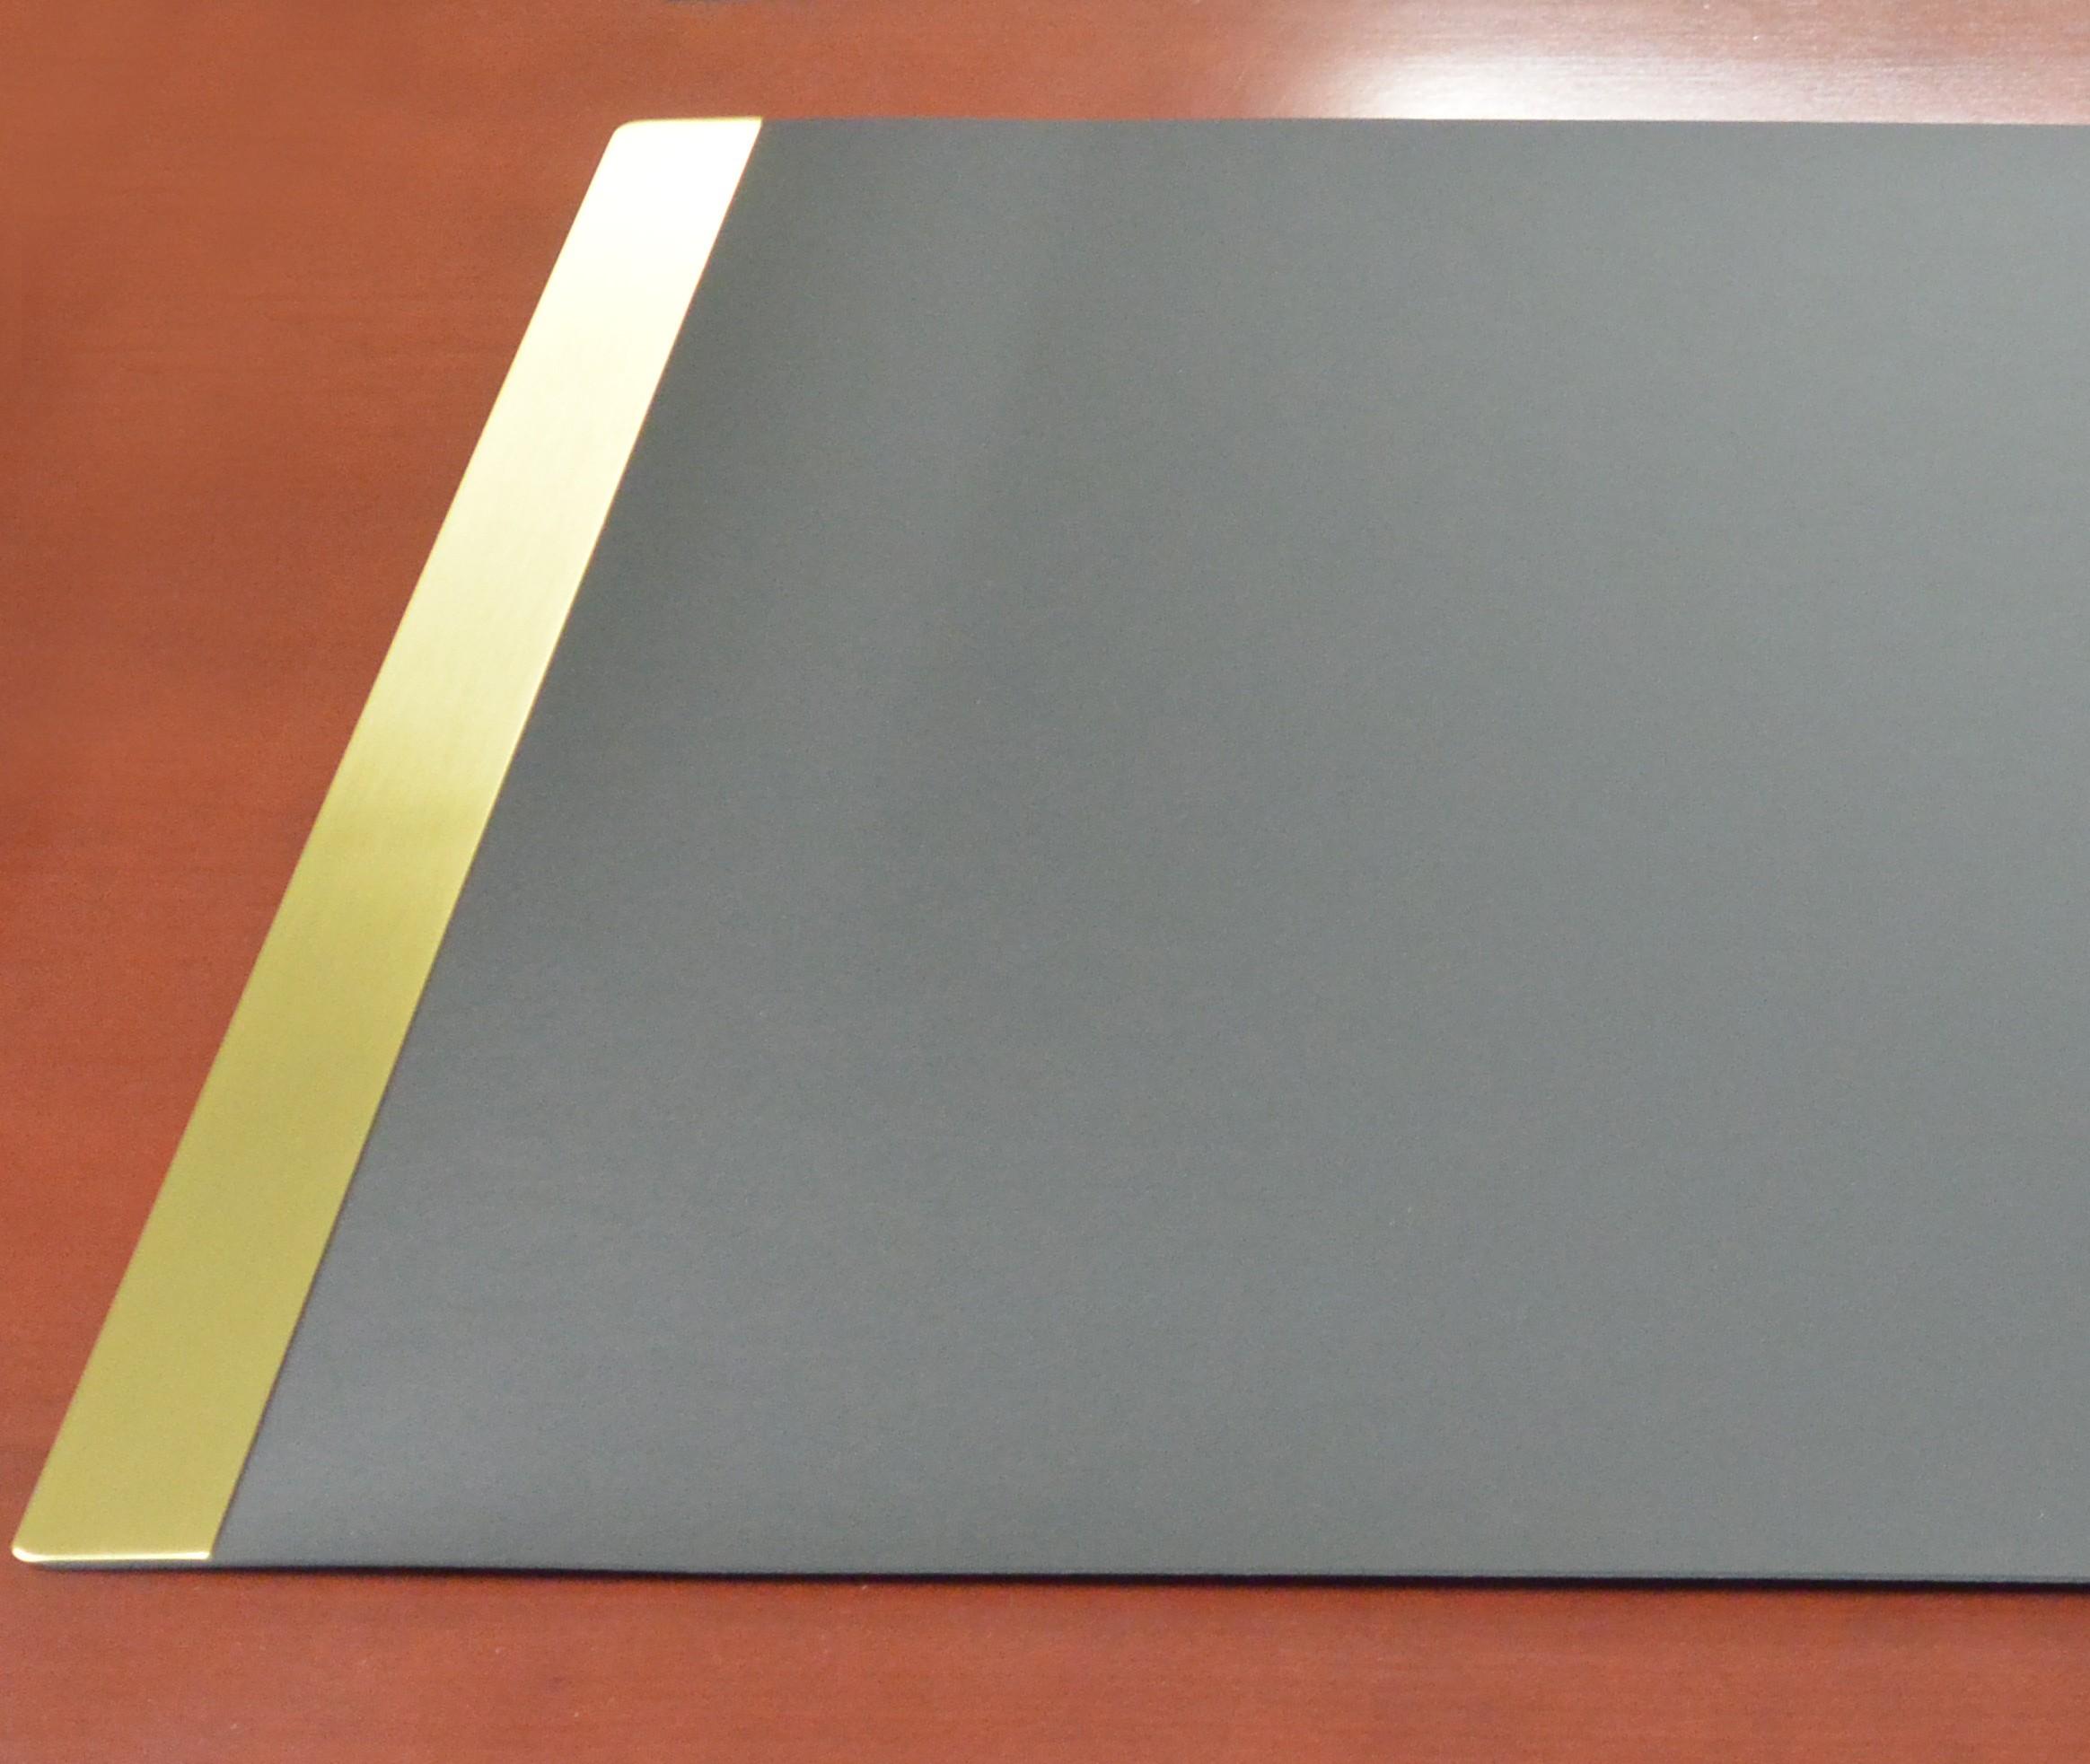 Linoleum Desk Pad With Metal Side Panels Highest Quality